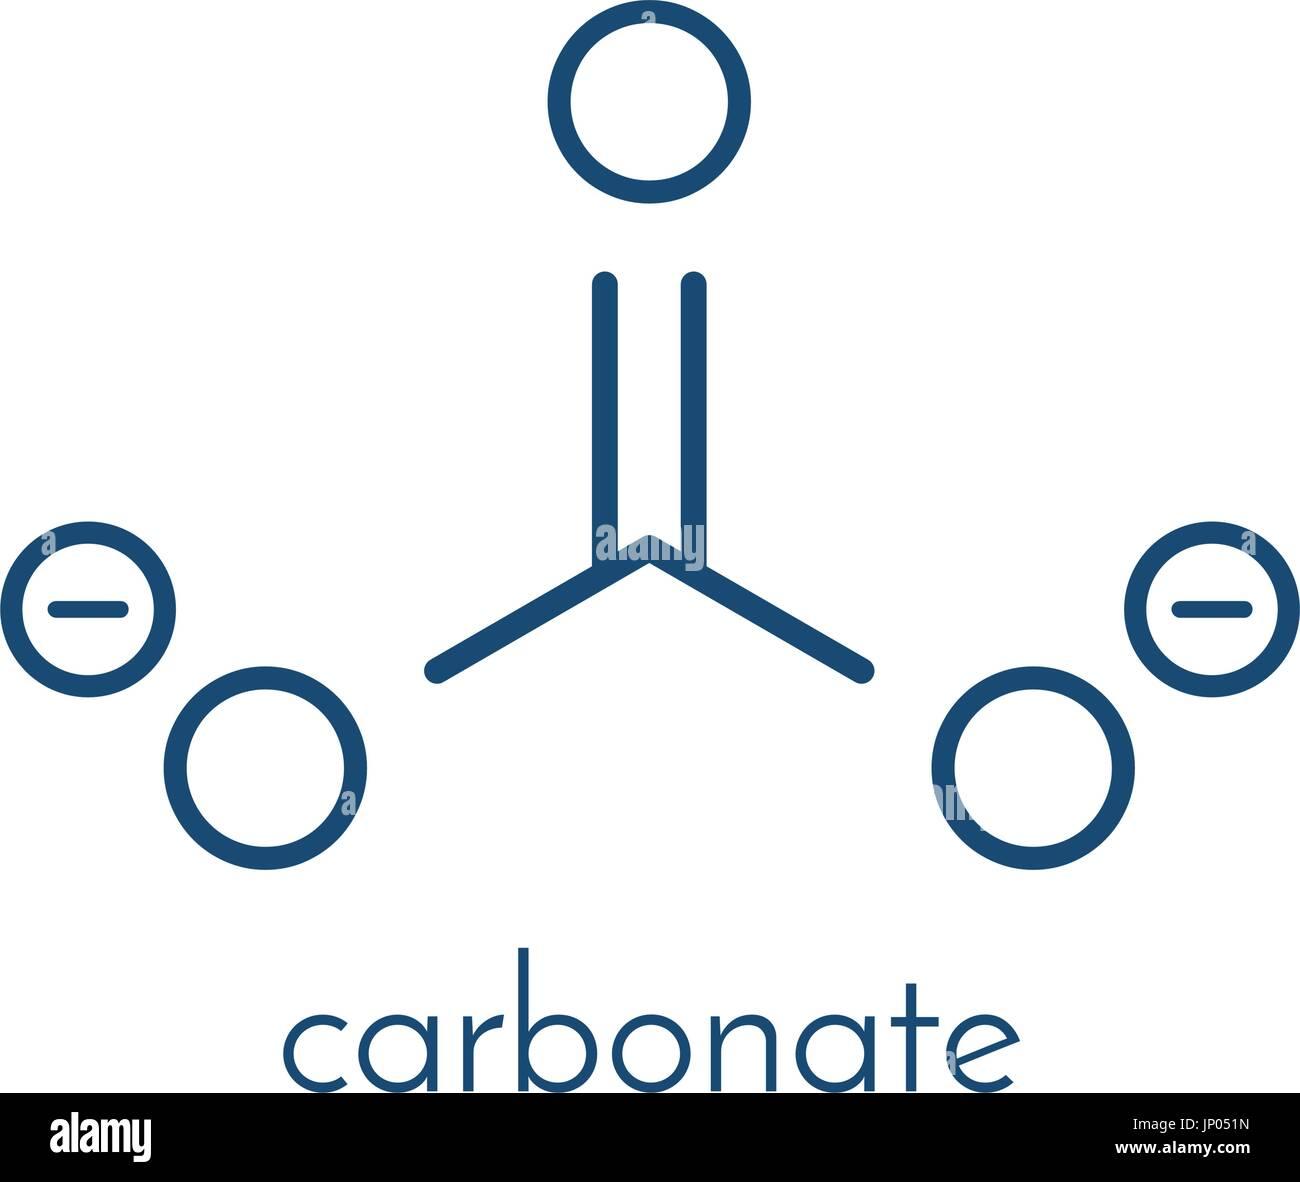 Carbonate Molecular Stock Photos Carbonate Molecular Stock Images